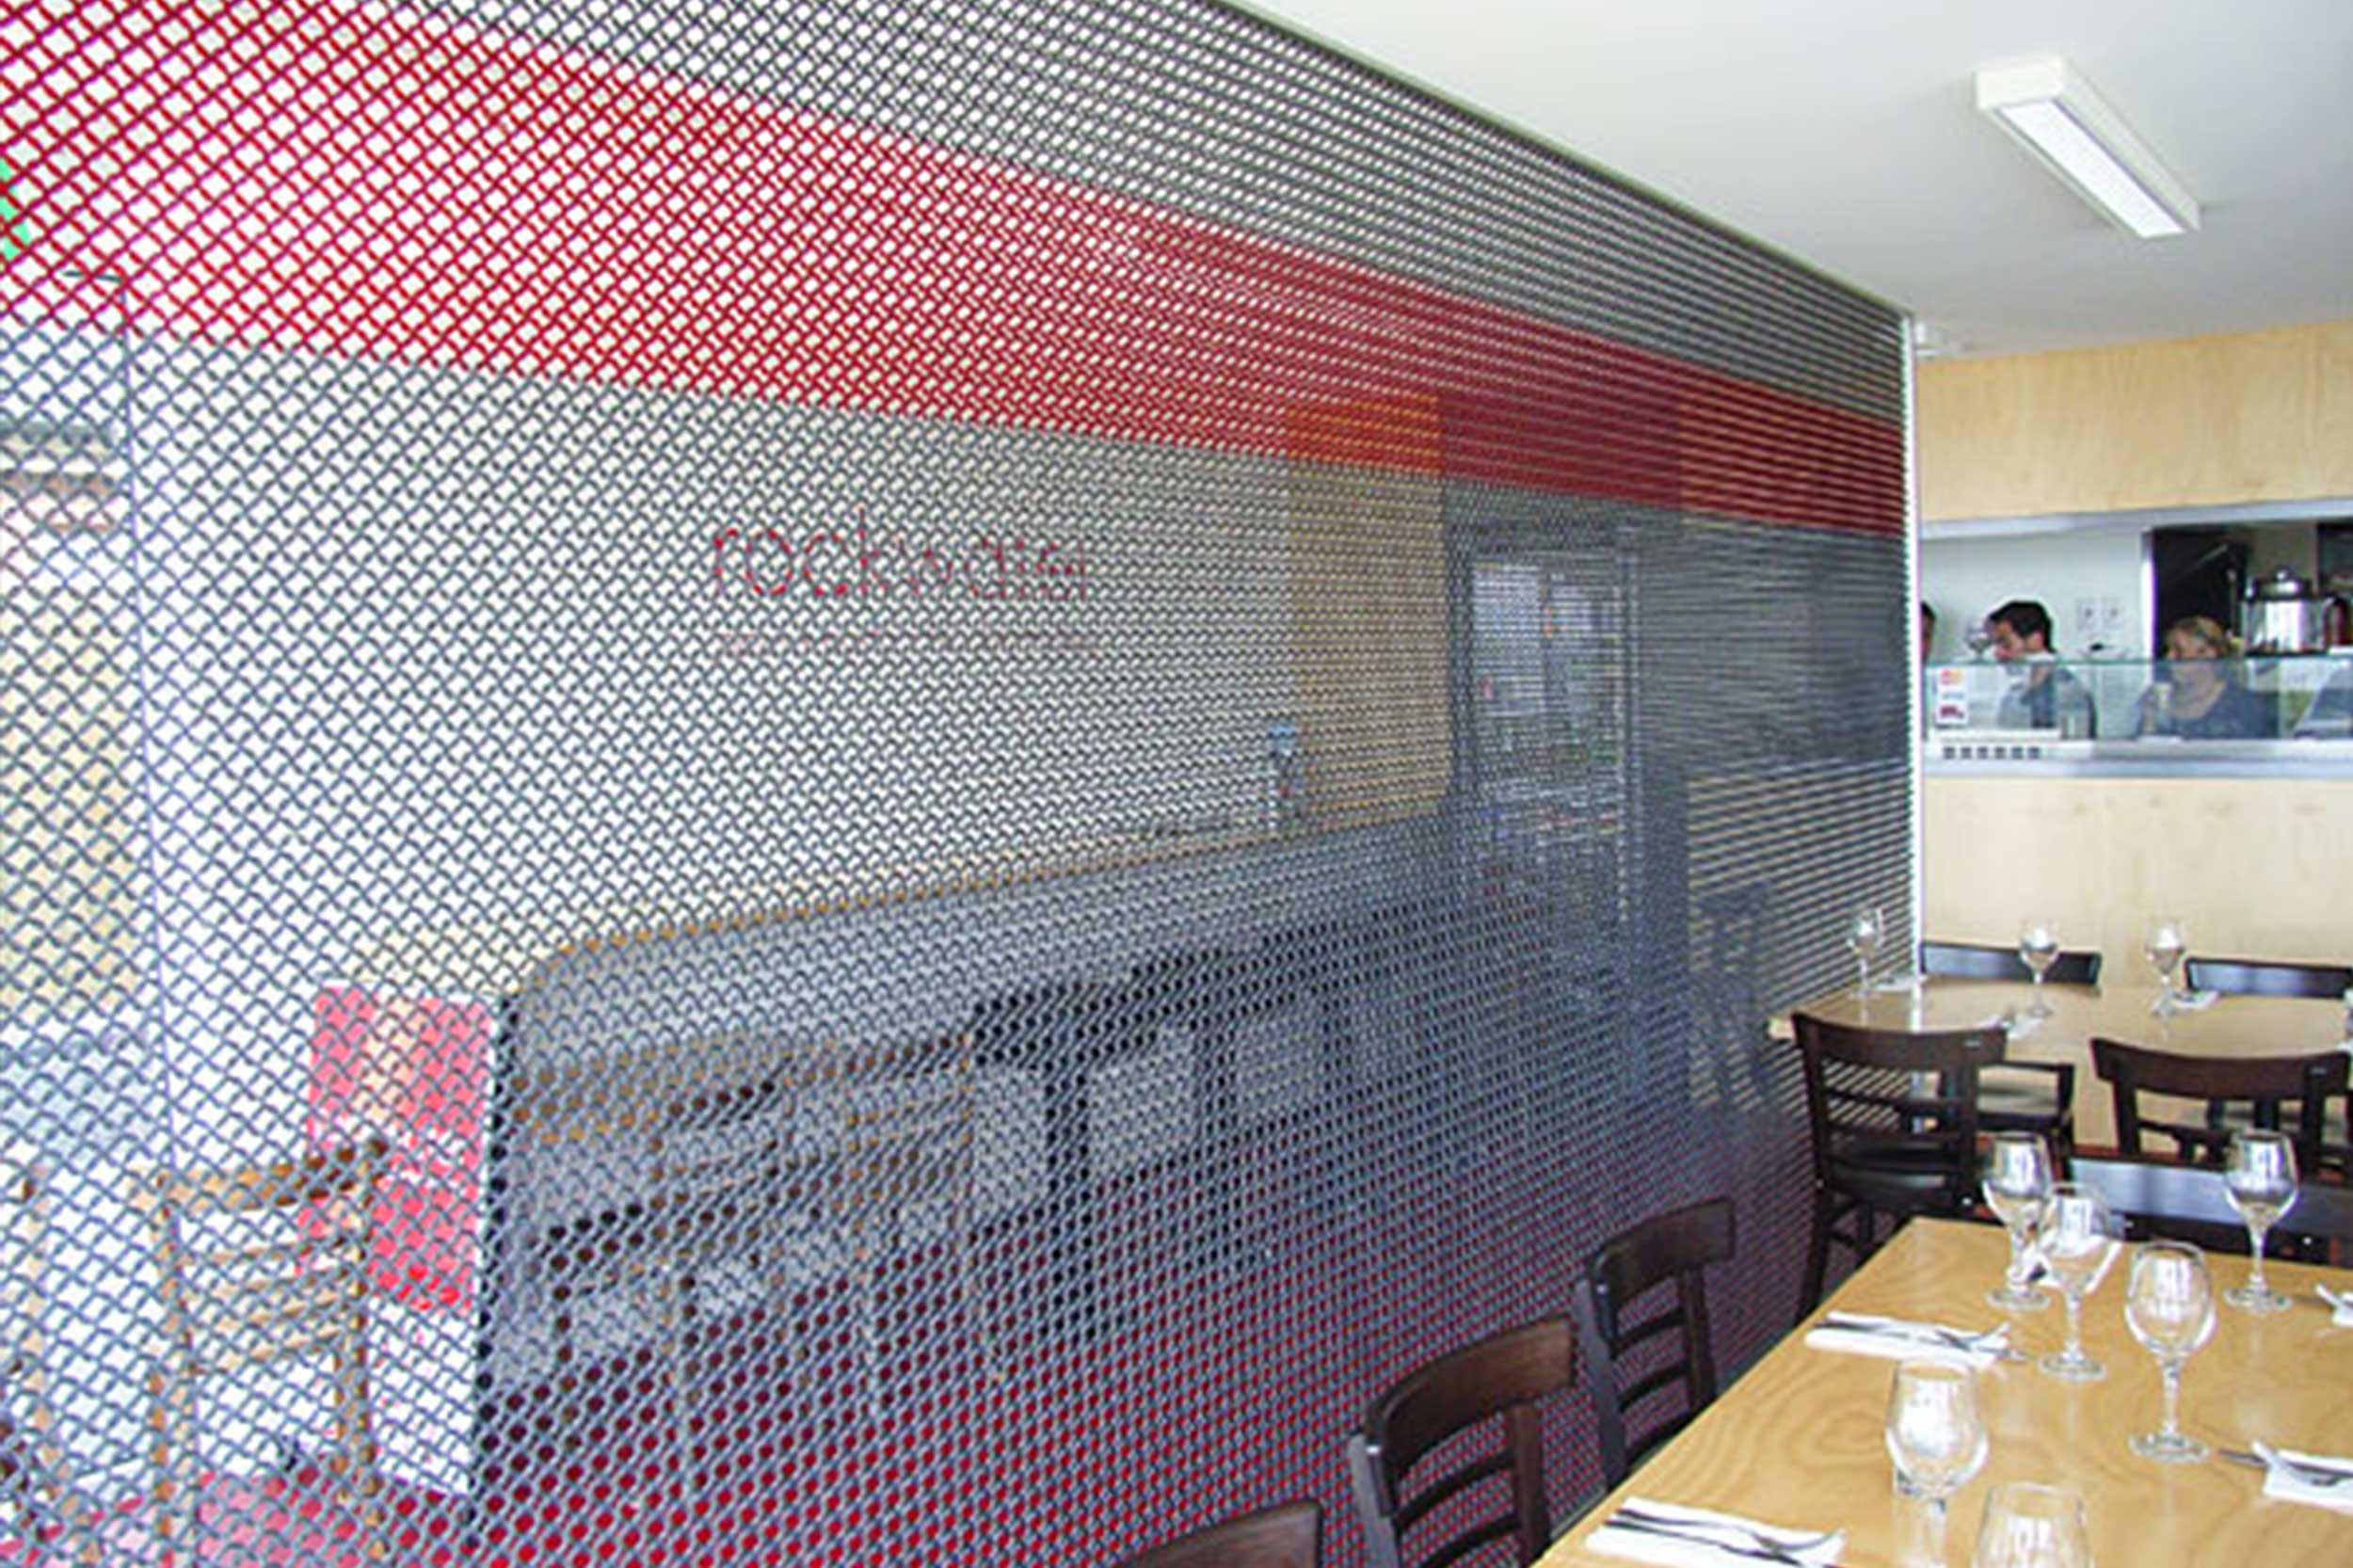 Restaurant Dividing Screen  Rockwater Restaurant, Australia